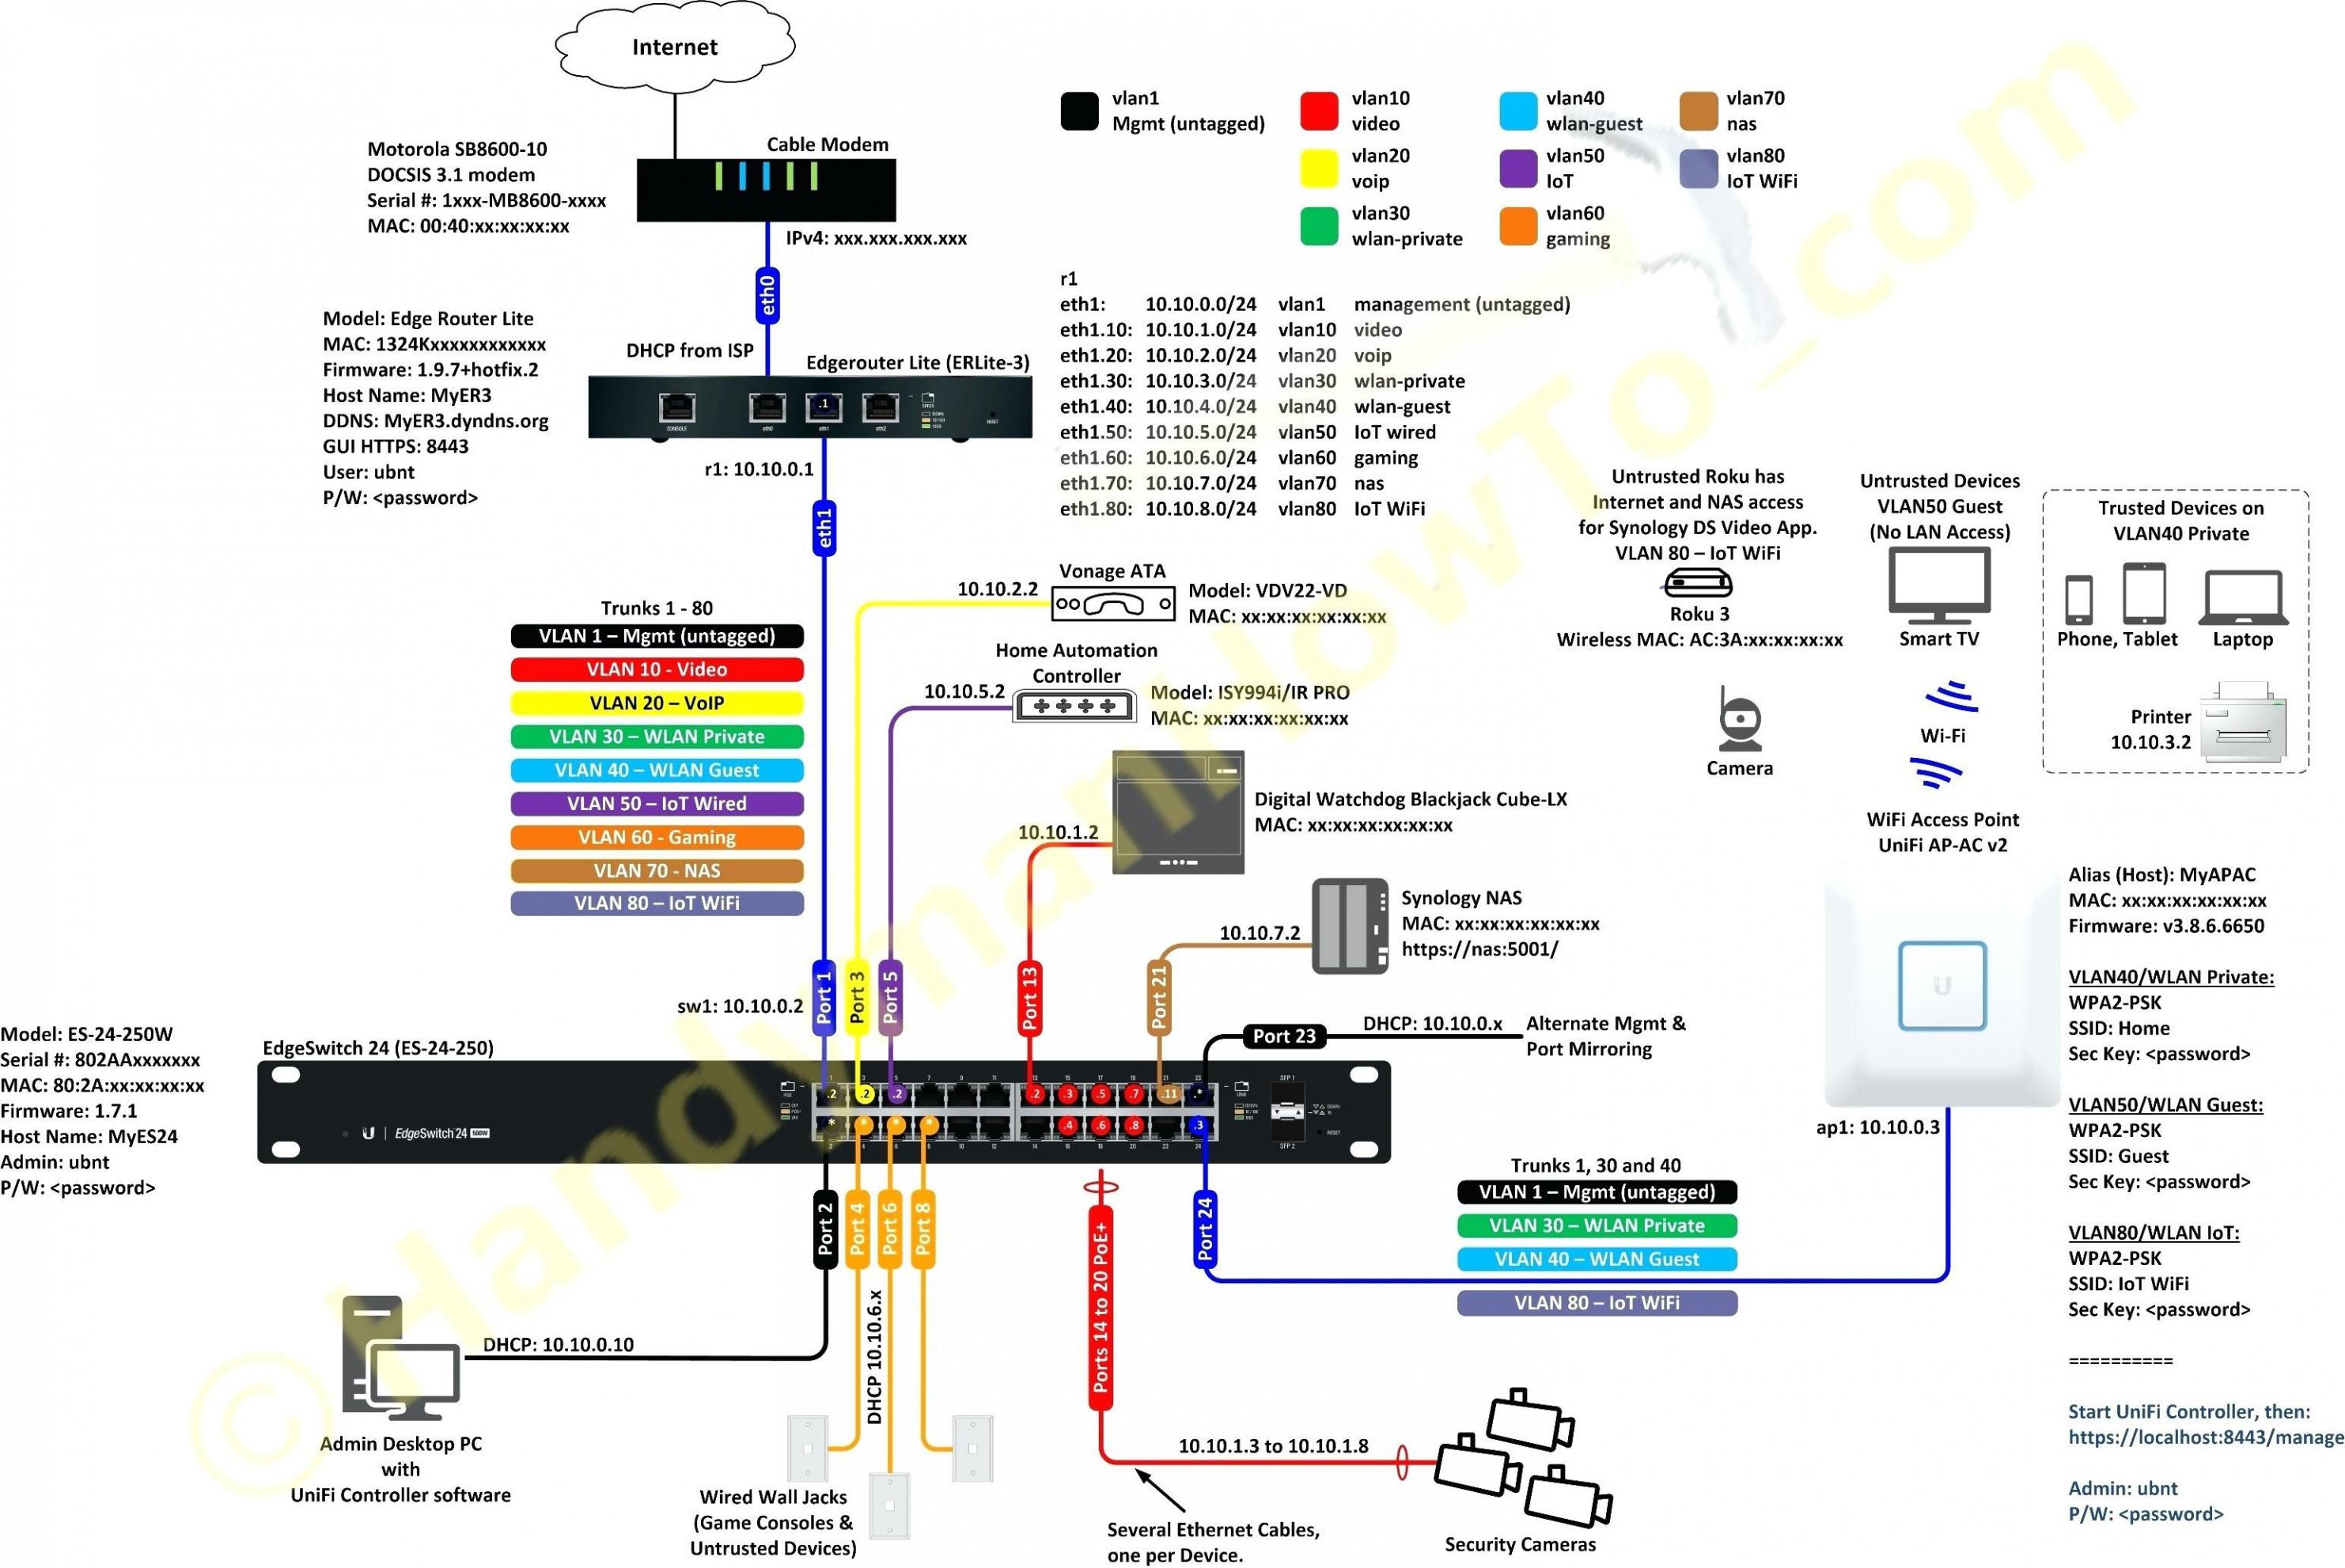 Wiring Diagram For Att Uverse | Wiring Diagram - Att Uverse Cat5 Wiring Diagram